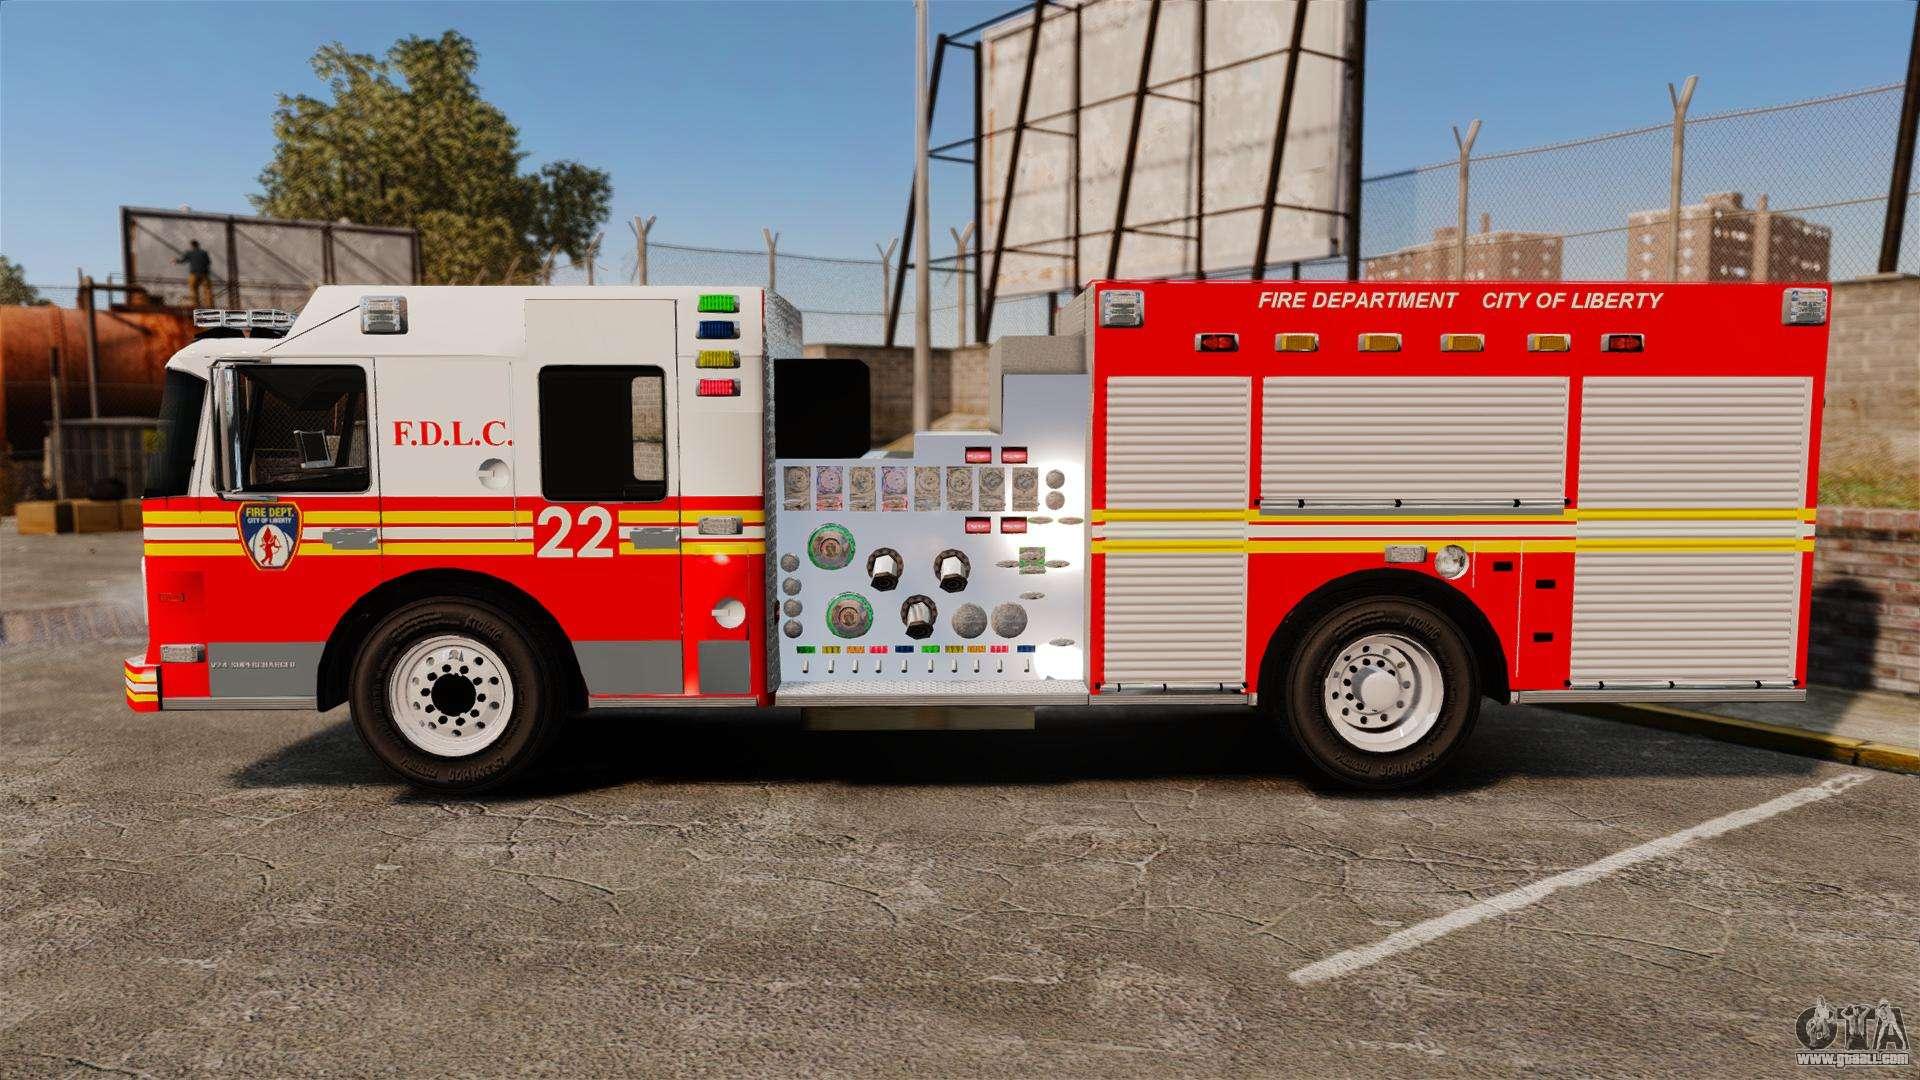 Firetruck FDLC [ELS] for GTA 4 Gta 4 Pc Cars